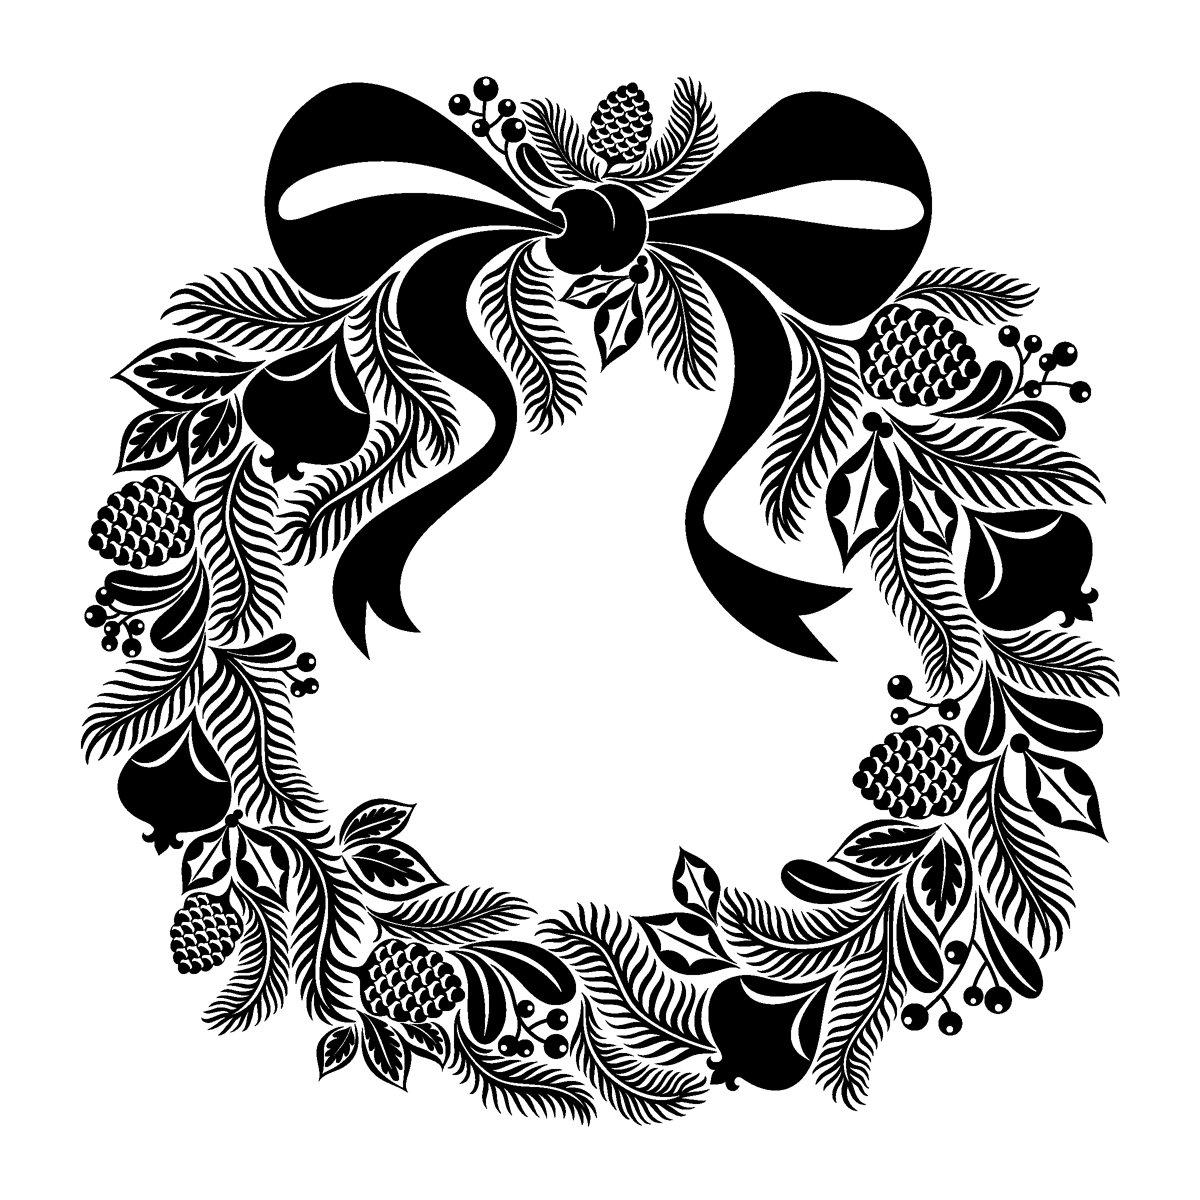 Wreath Inkadinkado Cling Stamp